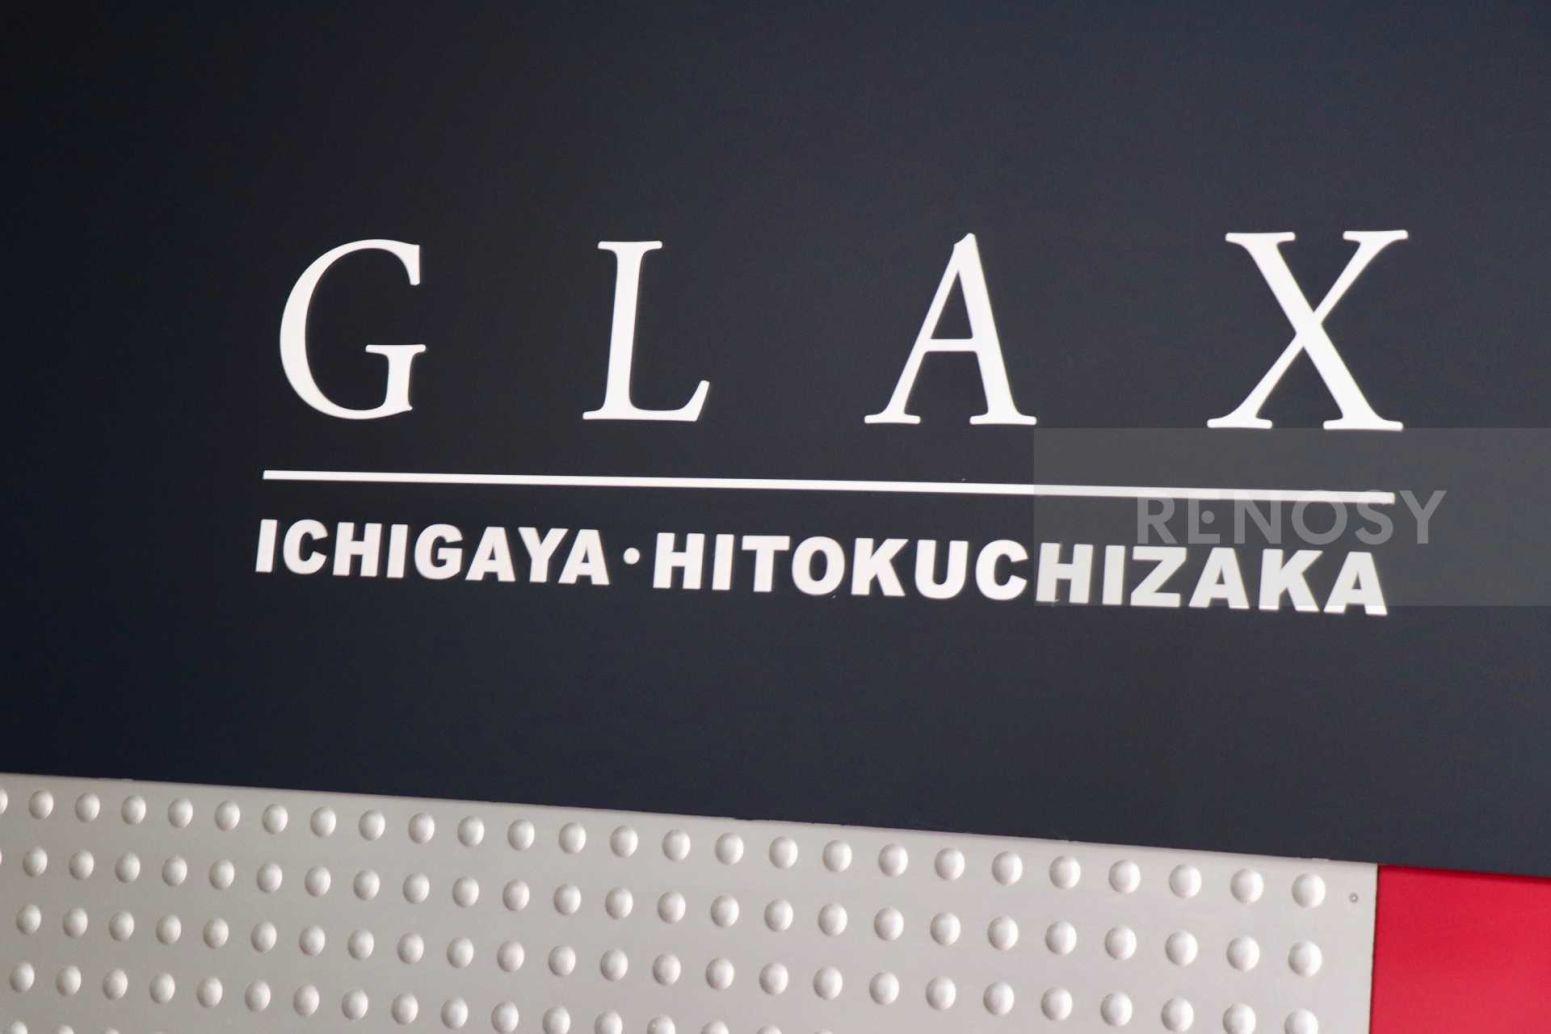 GLAX市ヶ谷一口坂